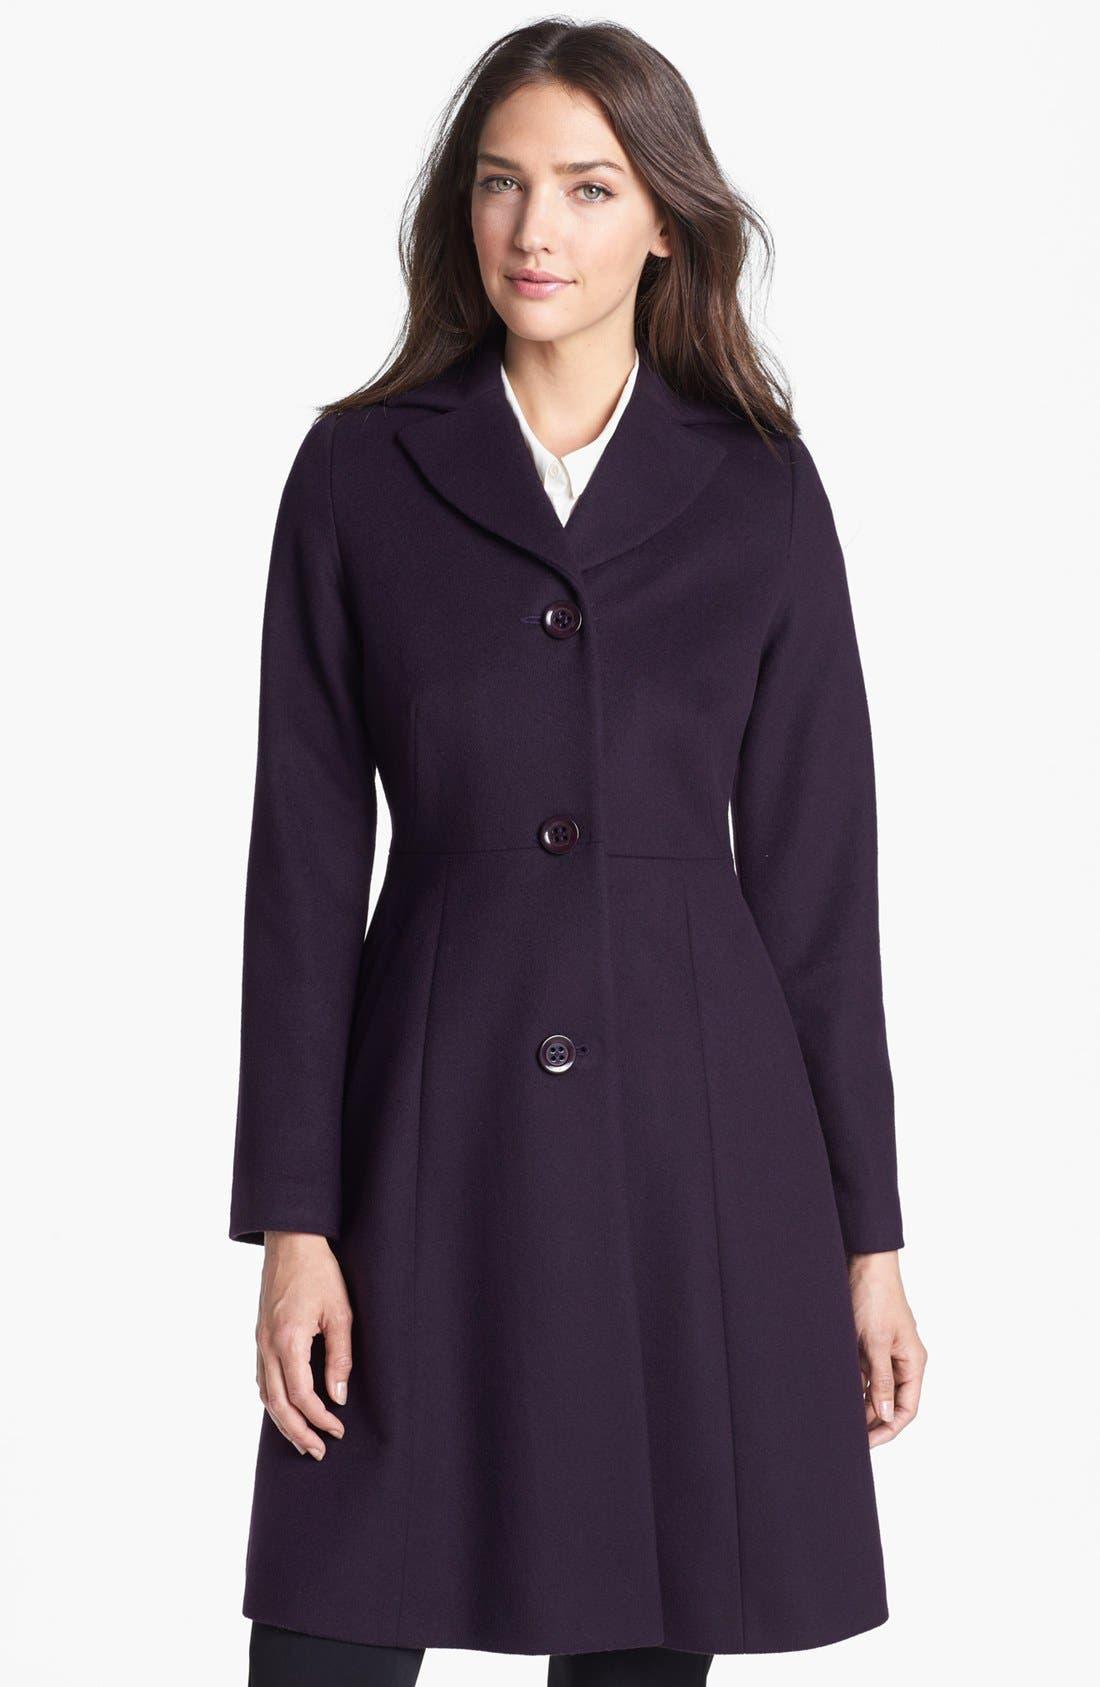 Main Image - Kristen Blake Fit & Flare Wool Blend Coat (Nordstrom Exclusive)